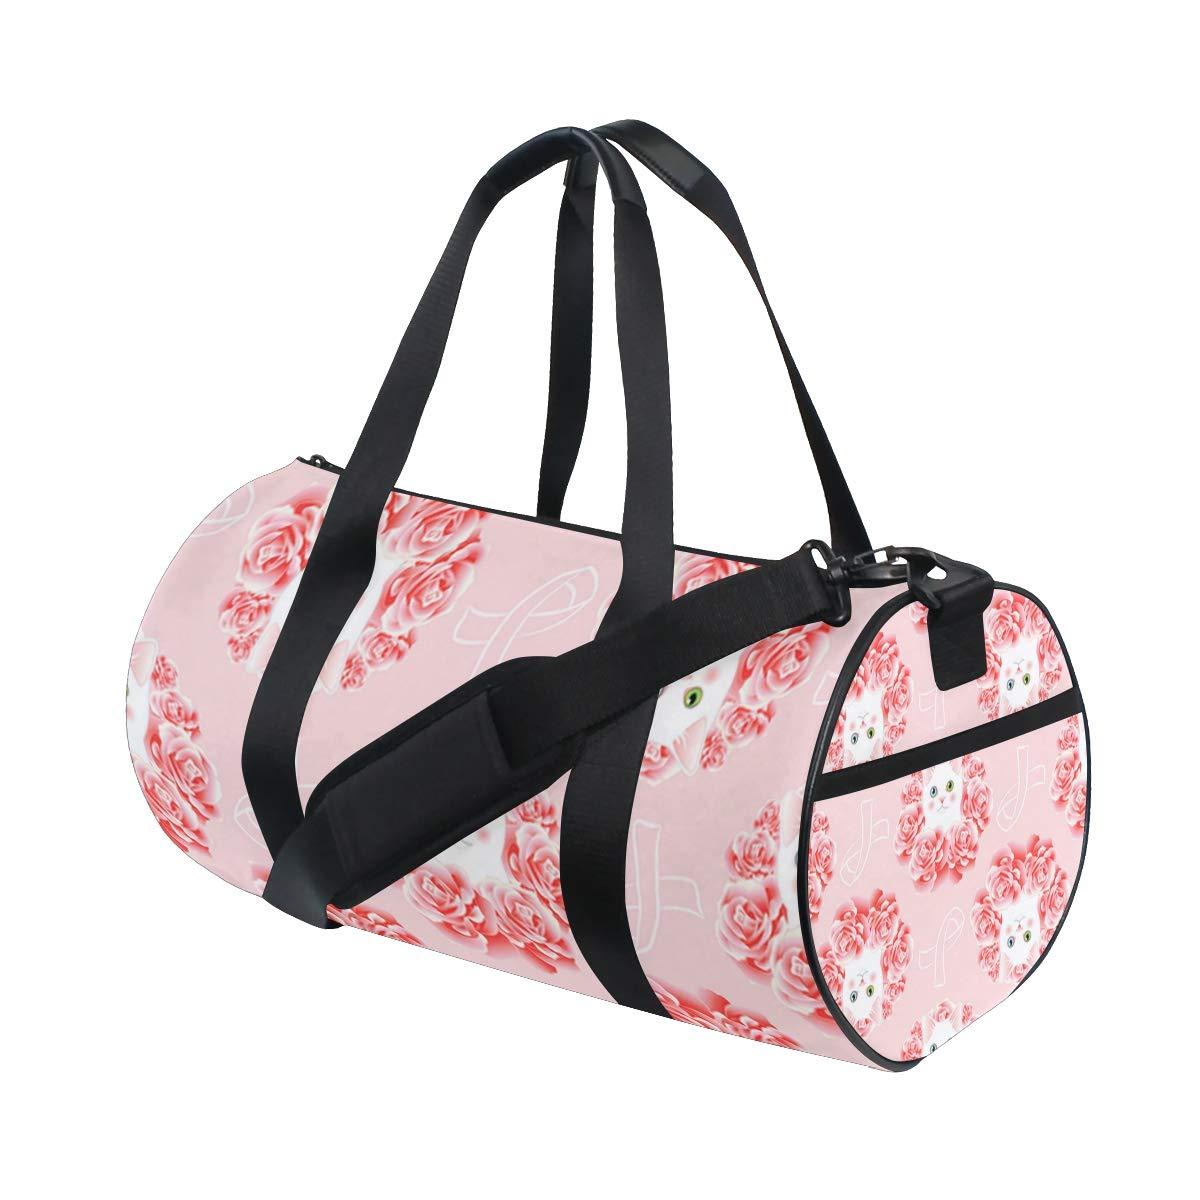 Sports Gym Duffel Barrel Bag Kitty Pink Awareness Ribbon Travel Luggage Handbag for Men Women